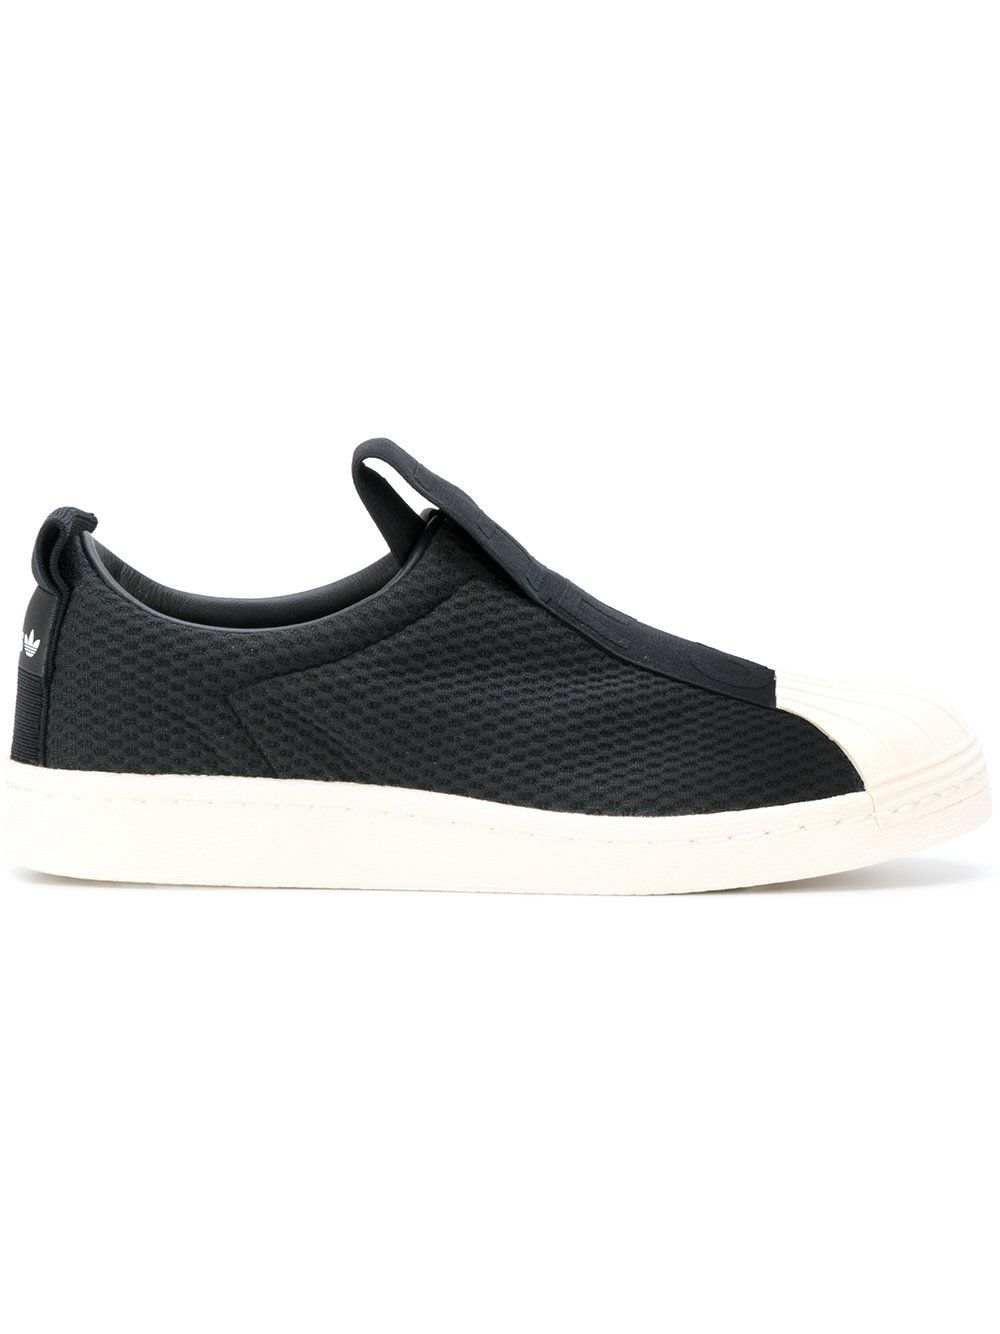 Adidas adidas Originals Superstar BW Slip - on zapatillas zapatos